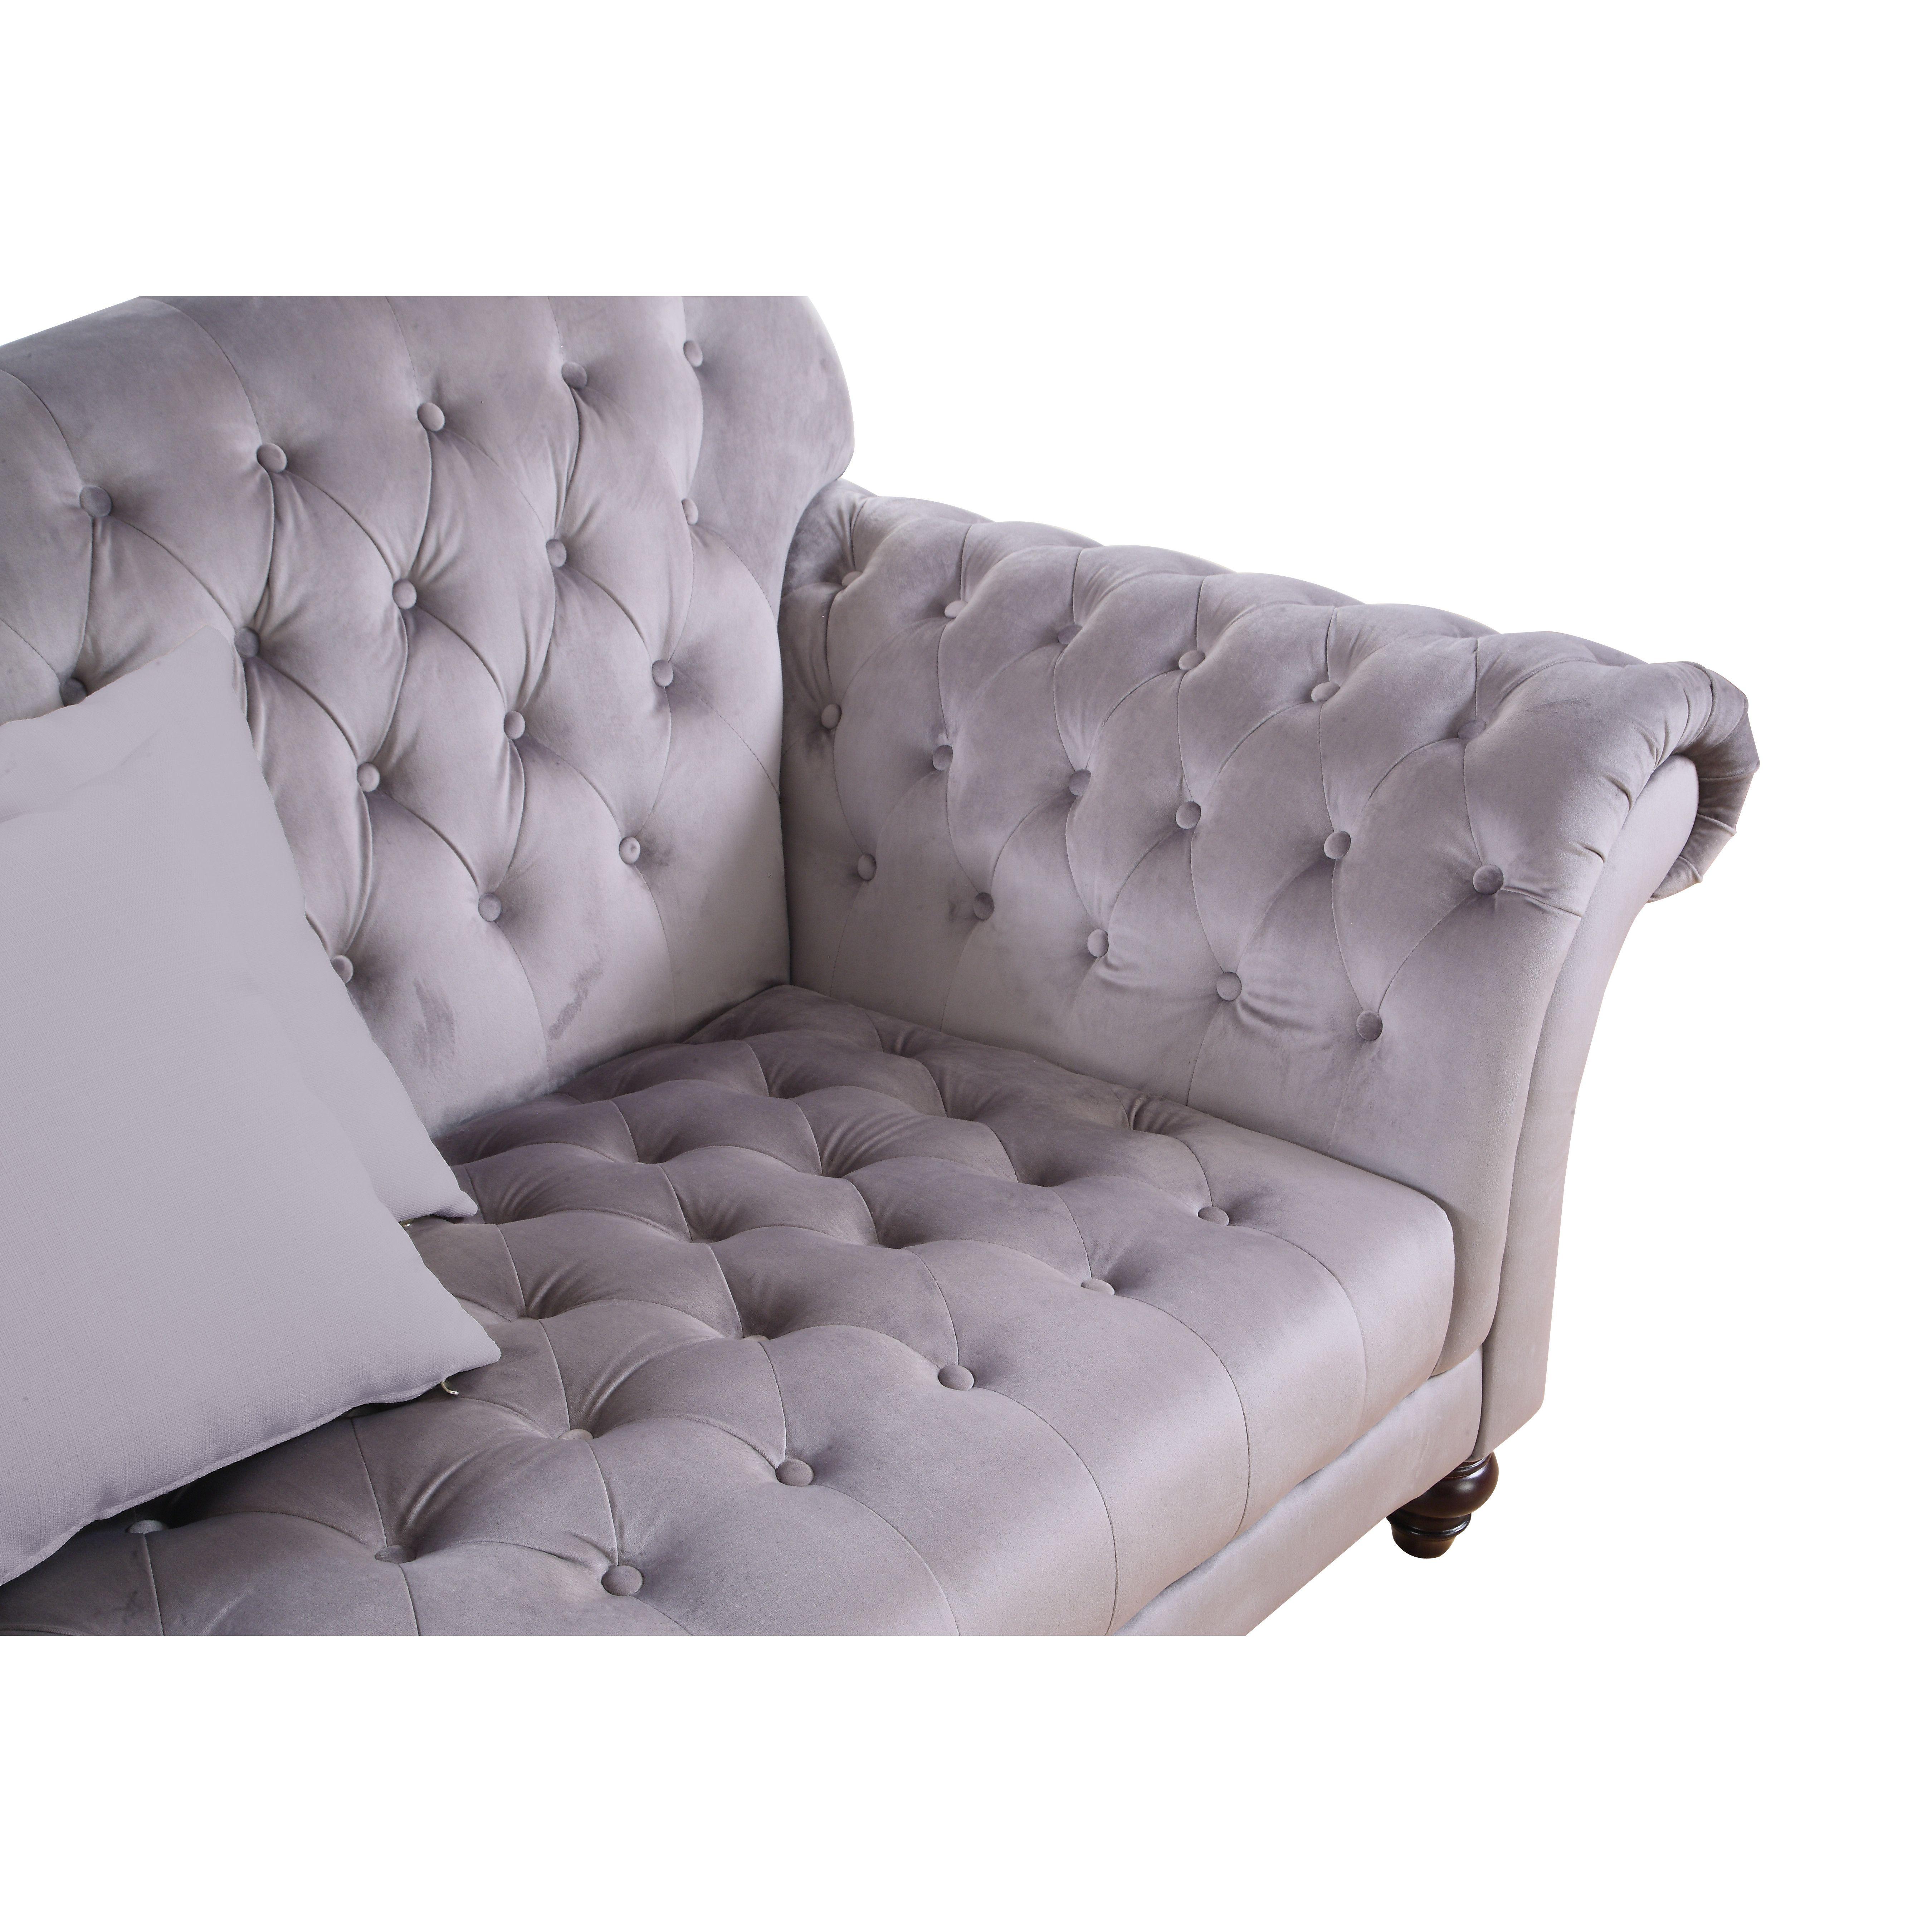 $700 sofa on Wayfair grey velvet cushions not removable